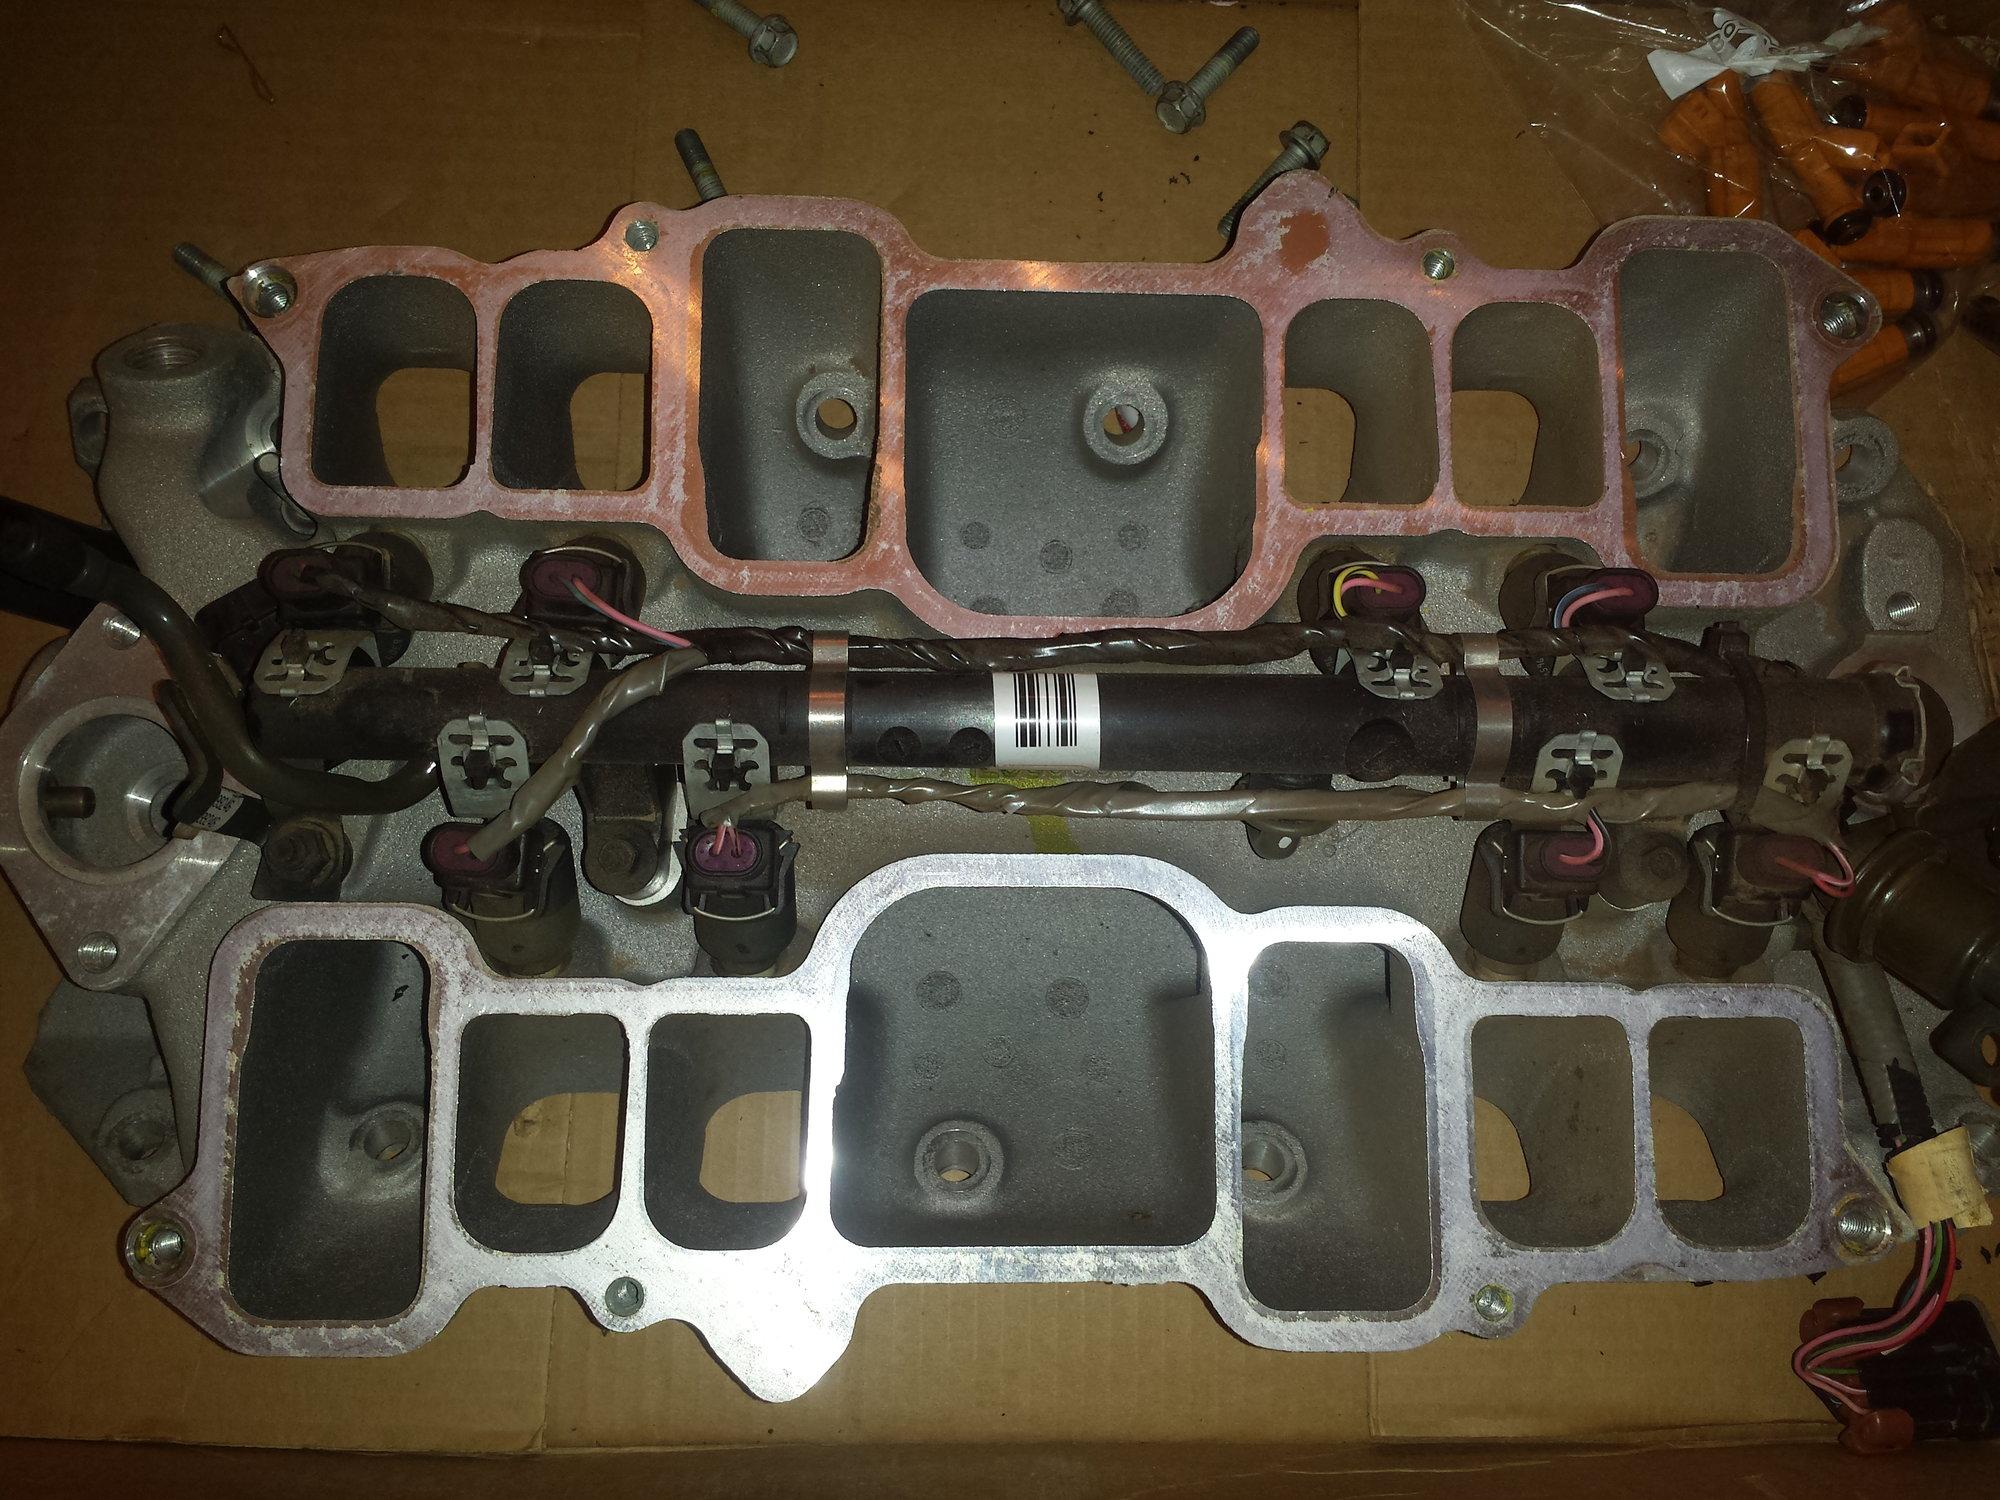 2000 k3500 454 vortec valve question (fer all ya 96-2000